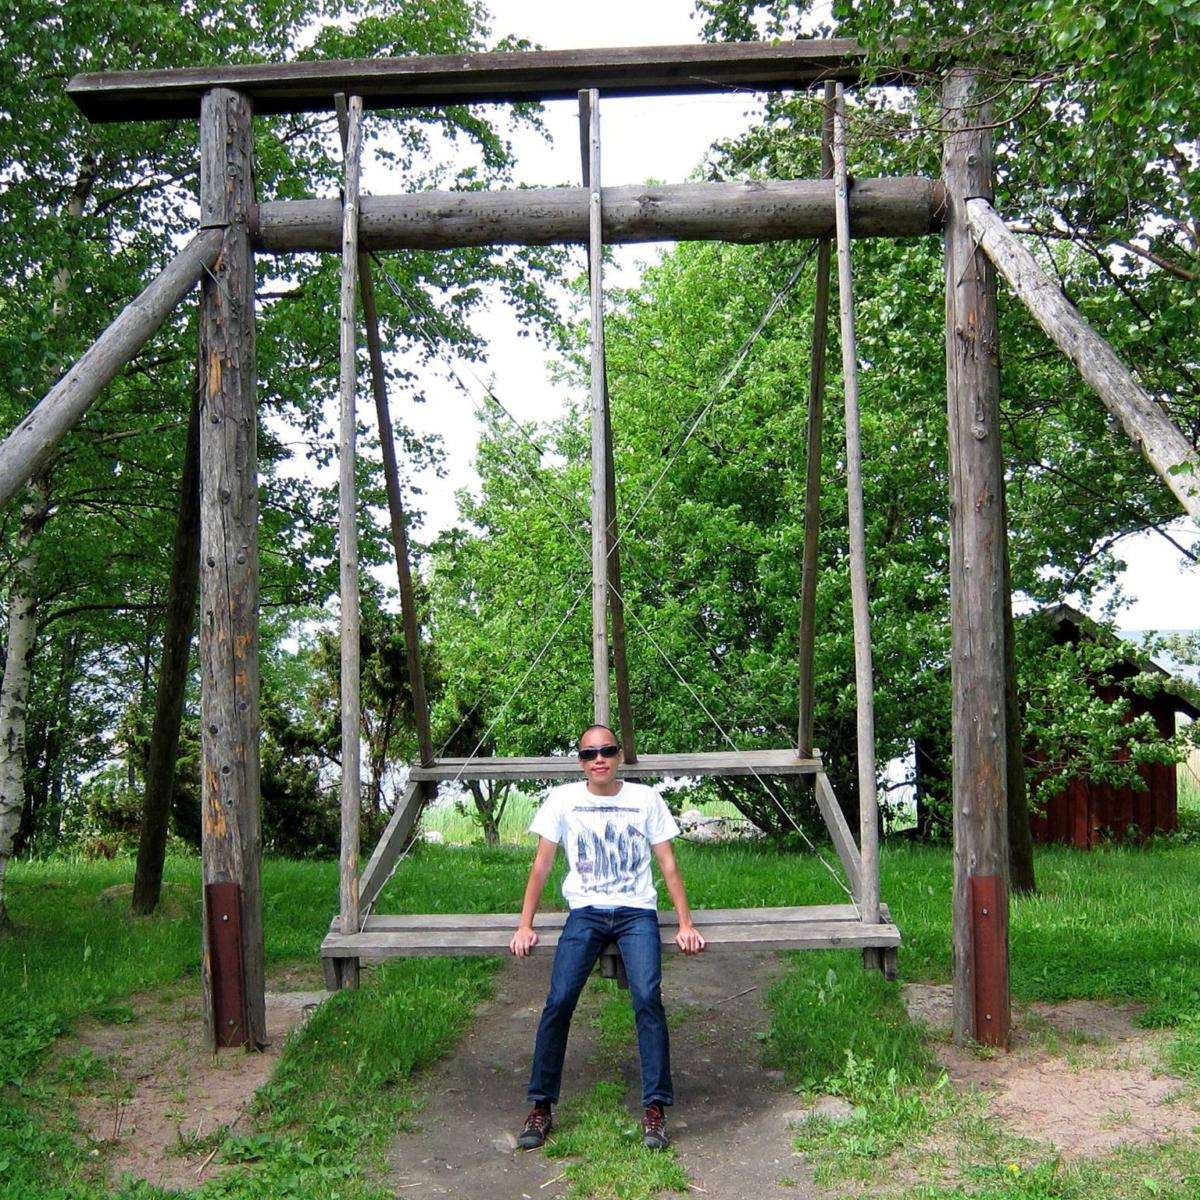 Estonian swing in Turbuneeme, Estonia